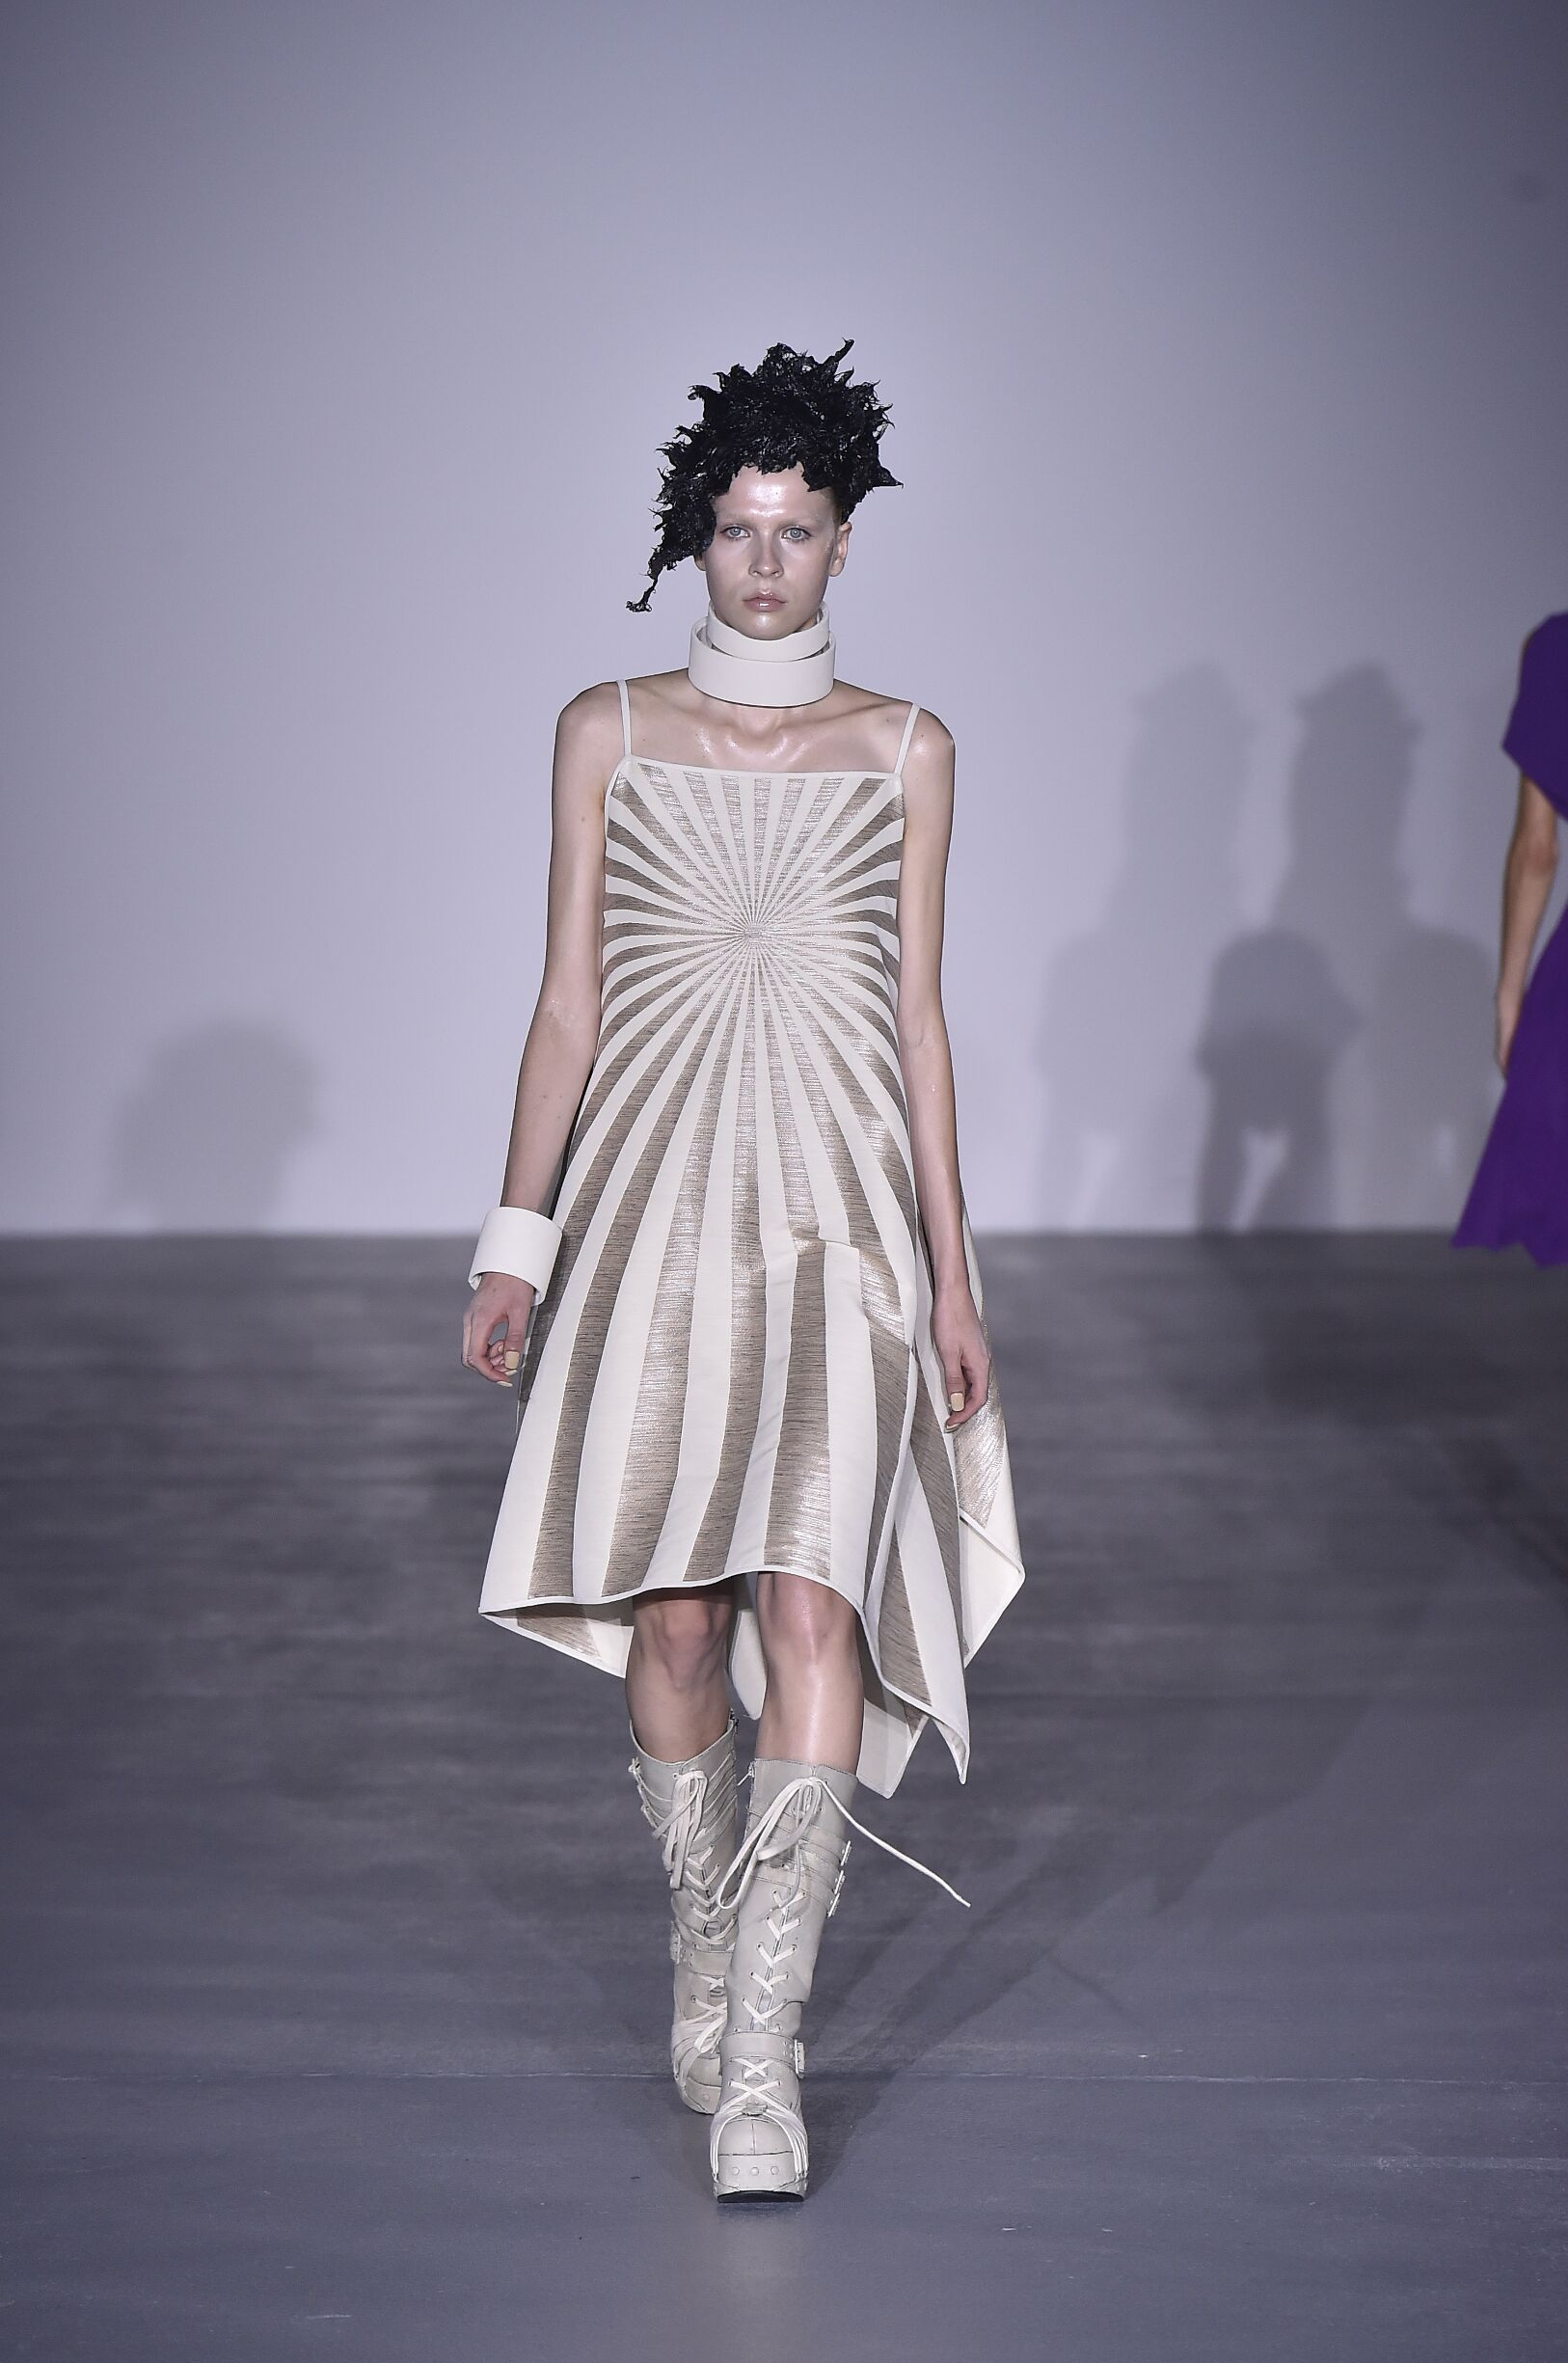 Gareth Pugh SS 2017 Womenswear